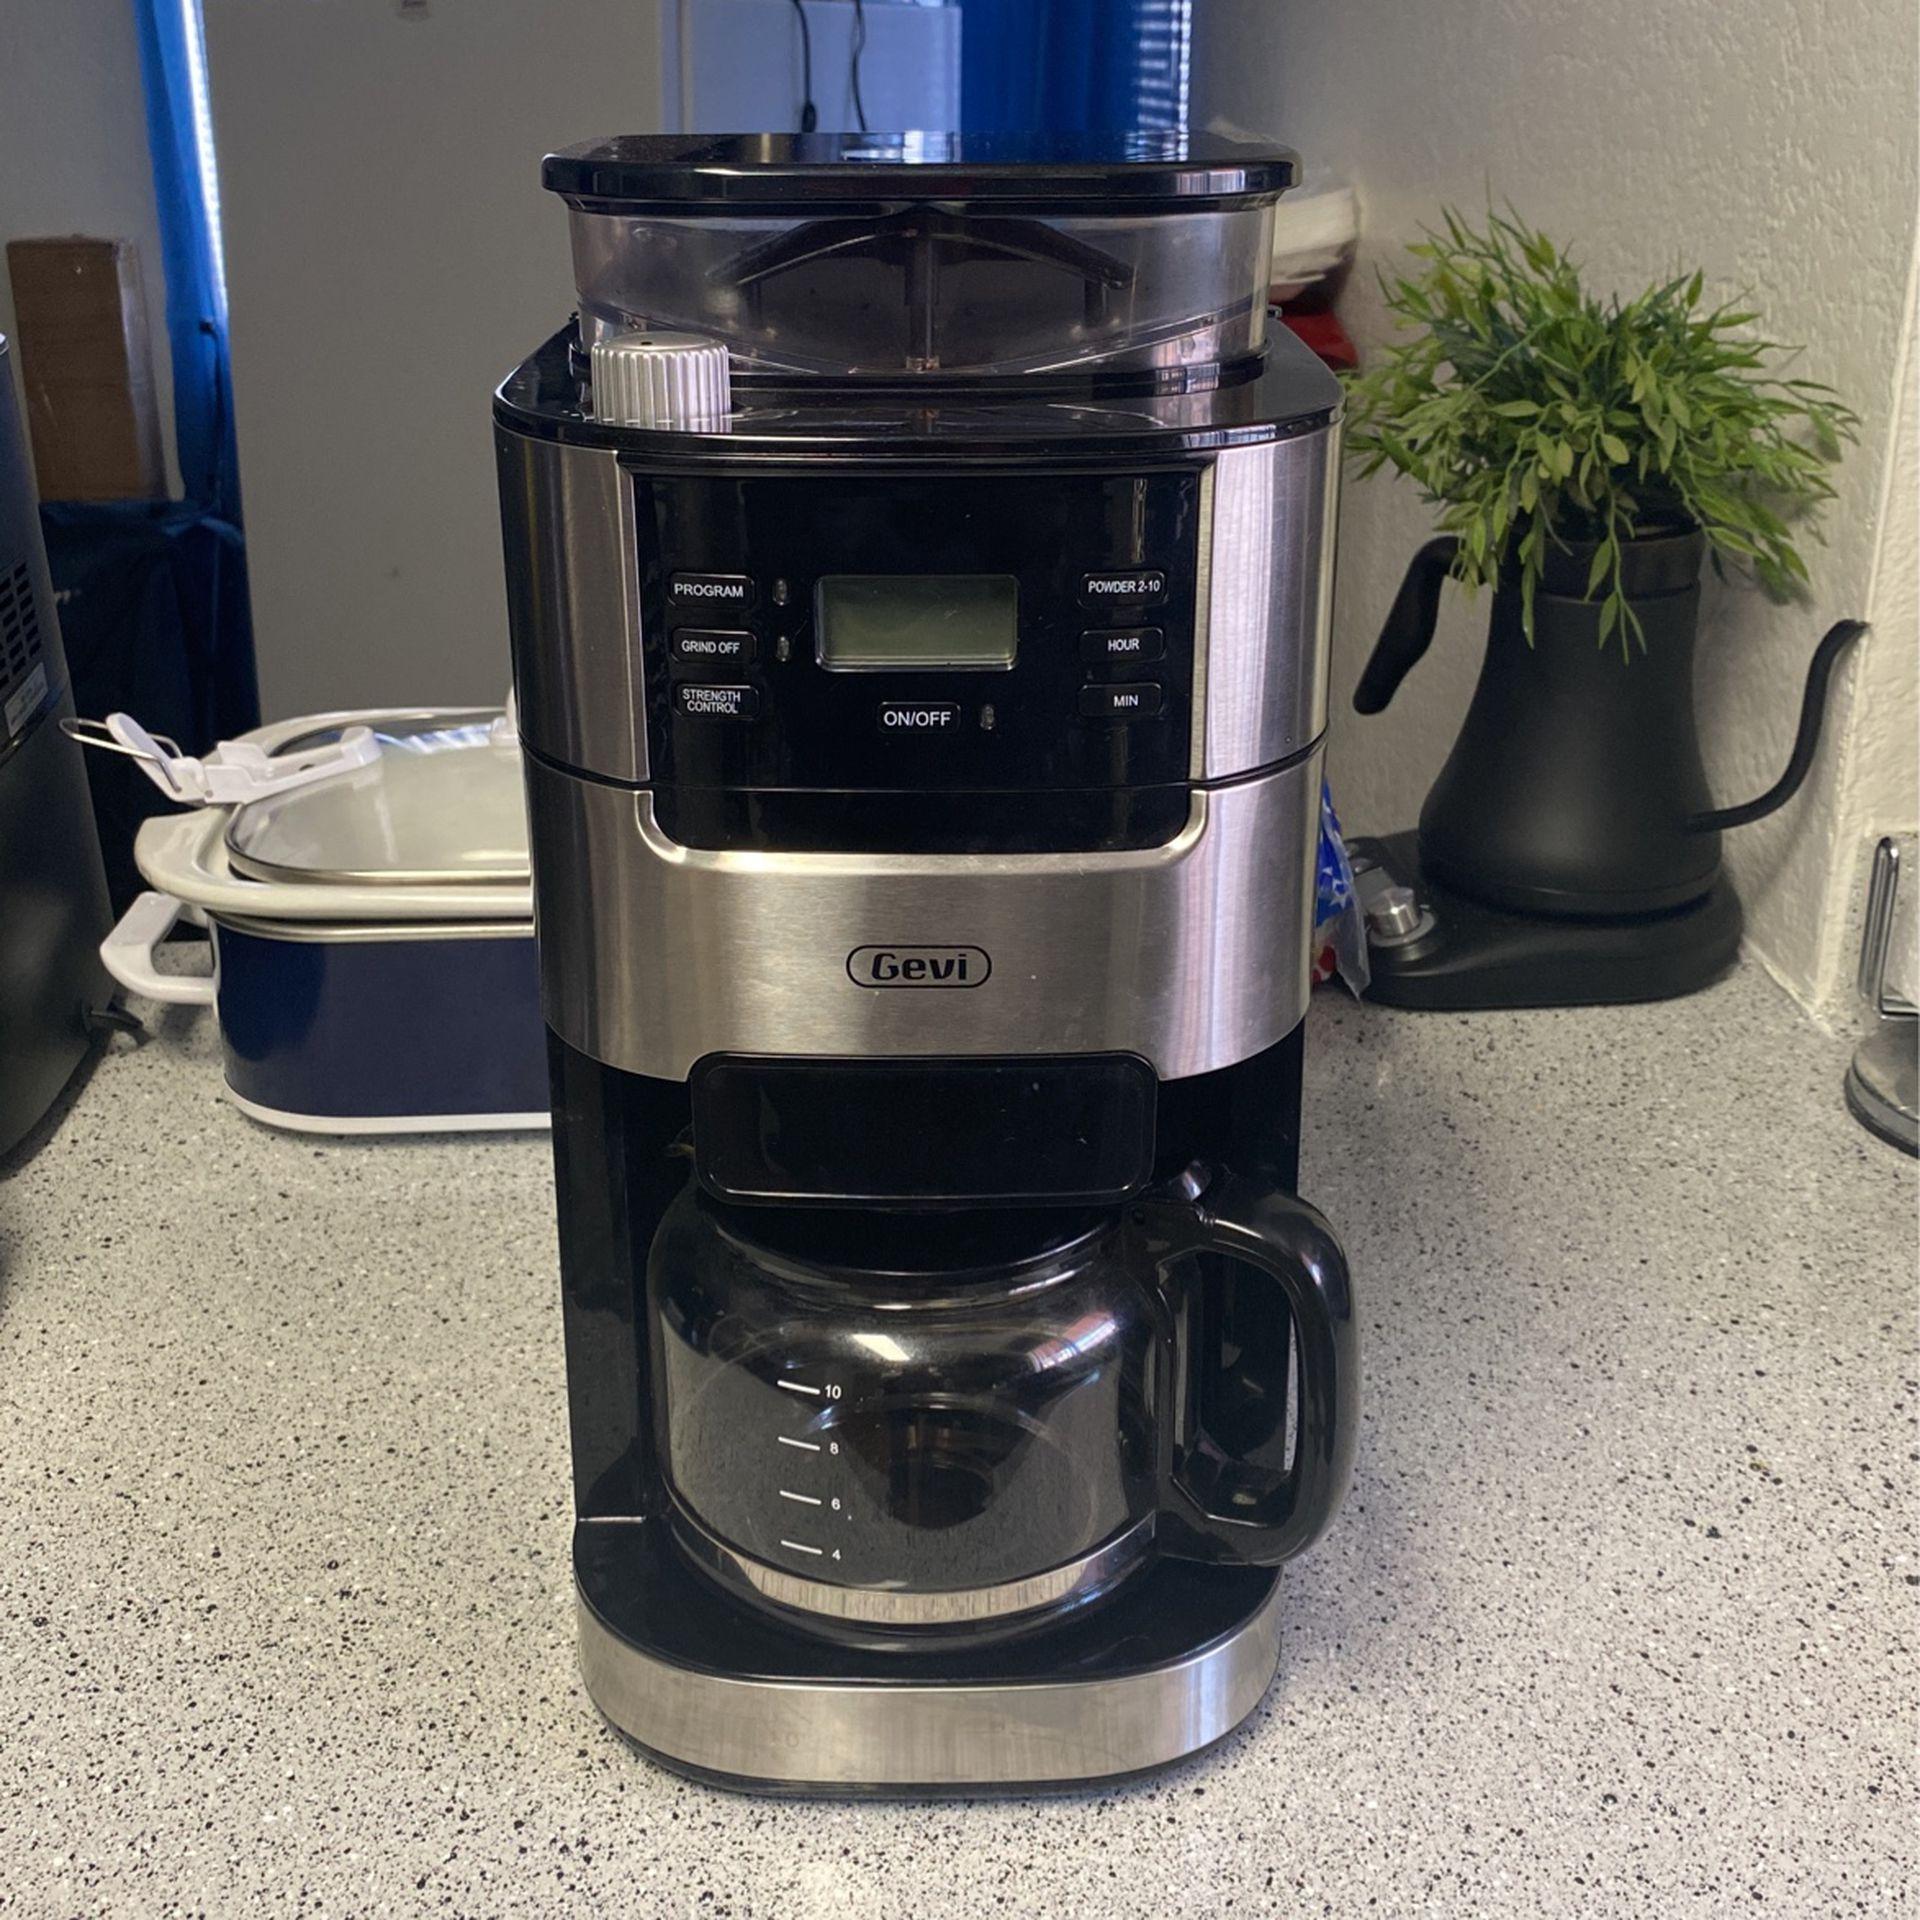 Gevi Coffee Maker & Grinder